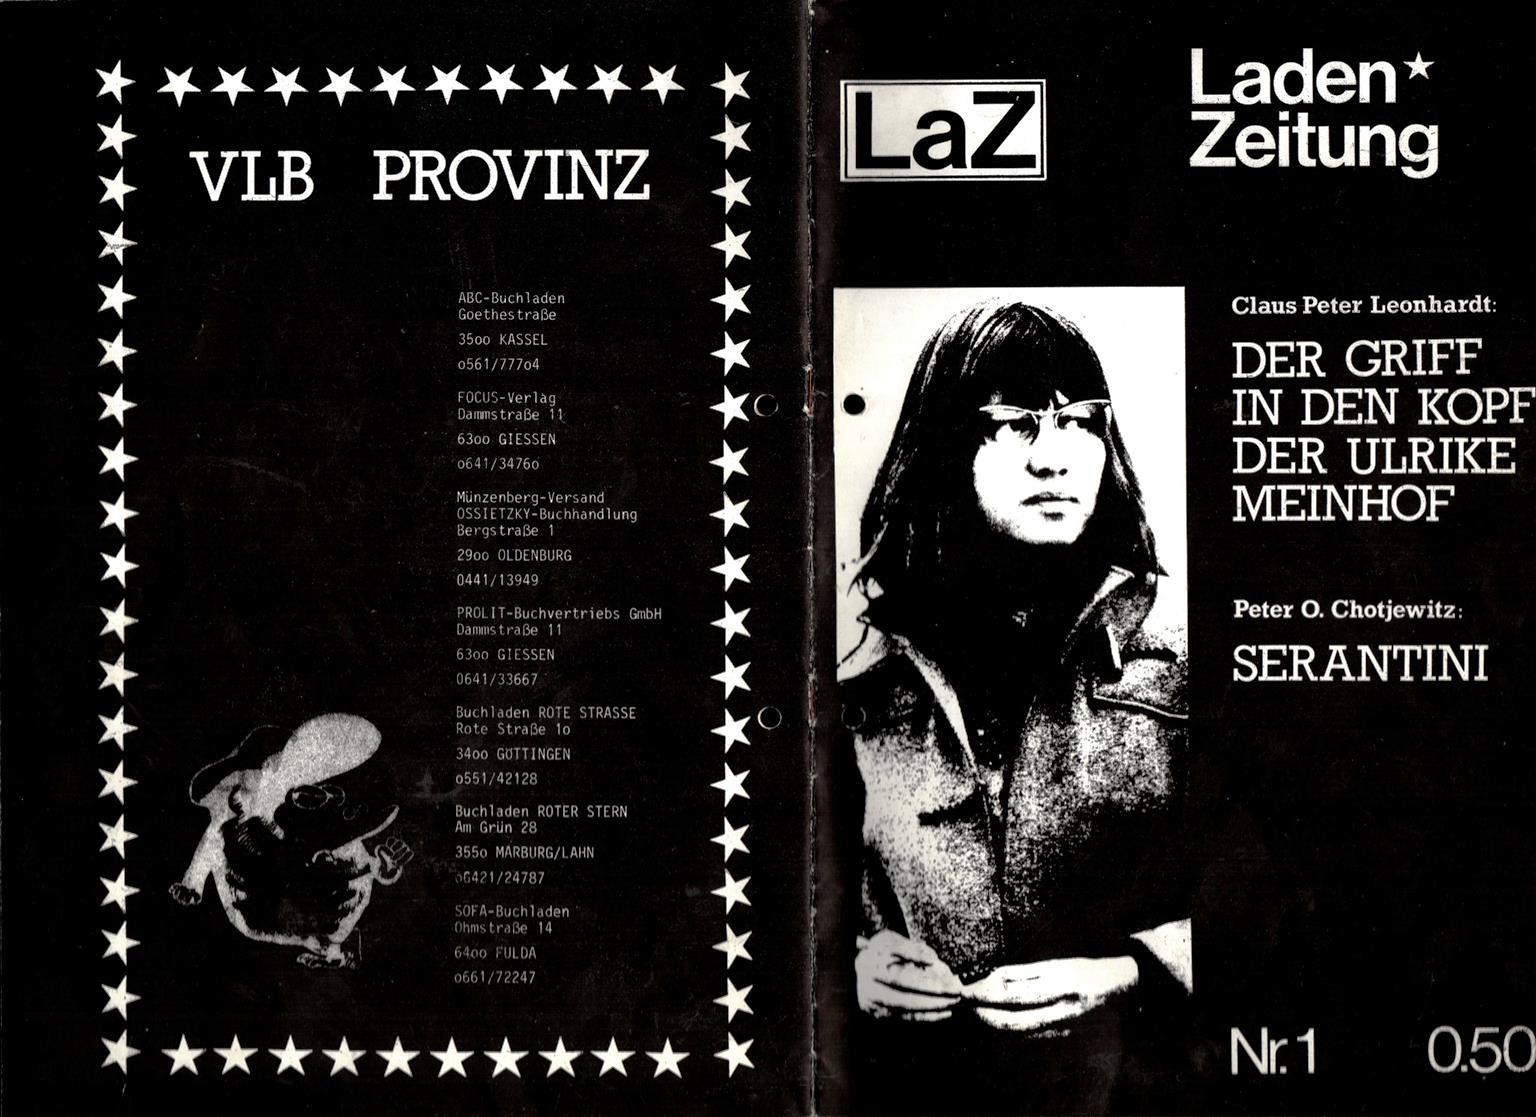 VLB_LaZ_1976_01_001